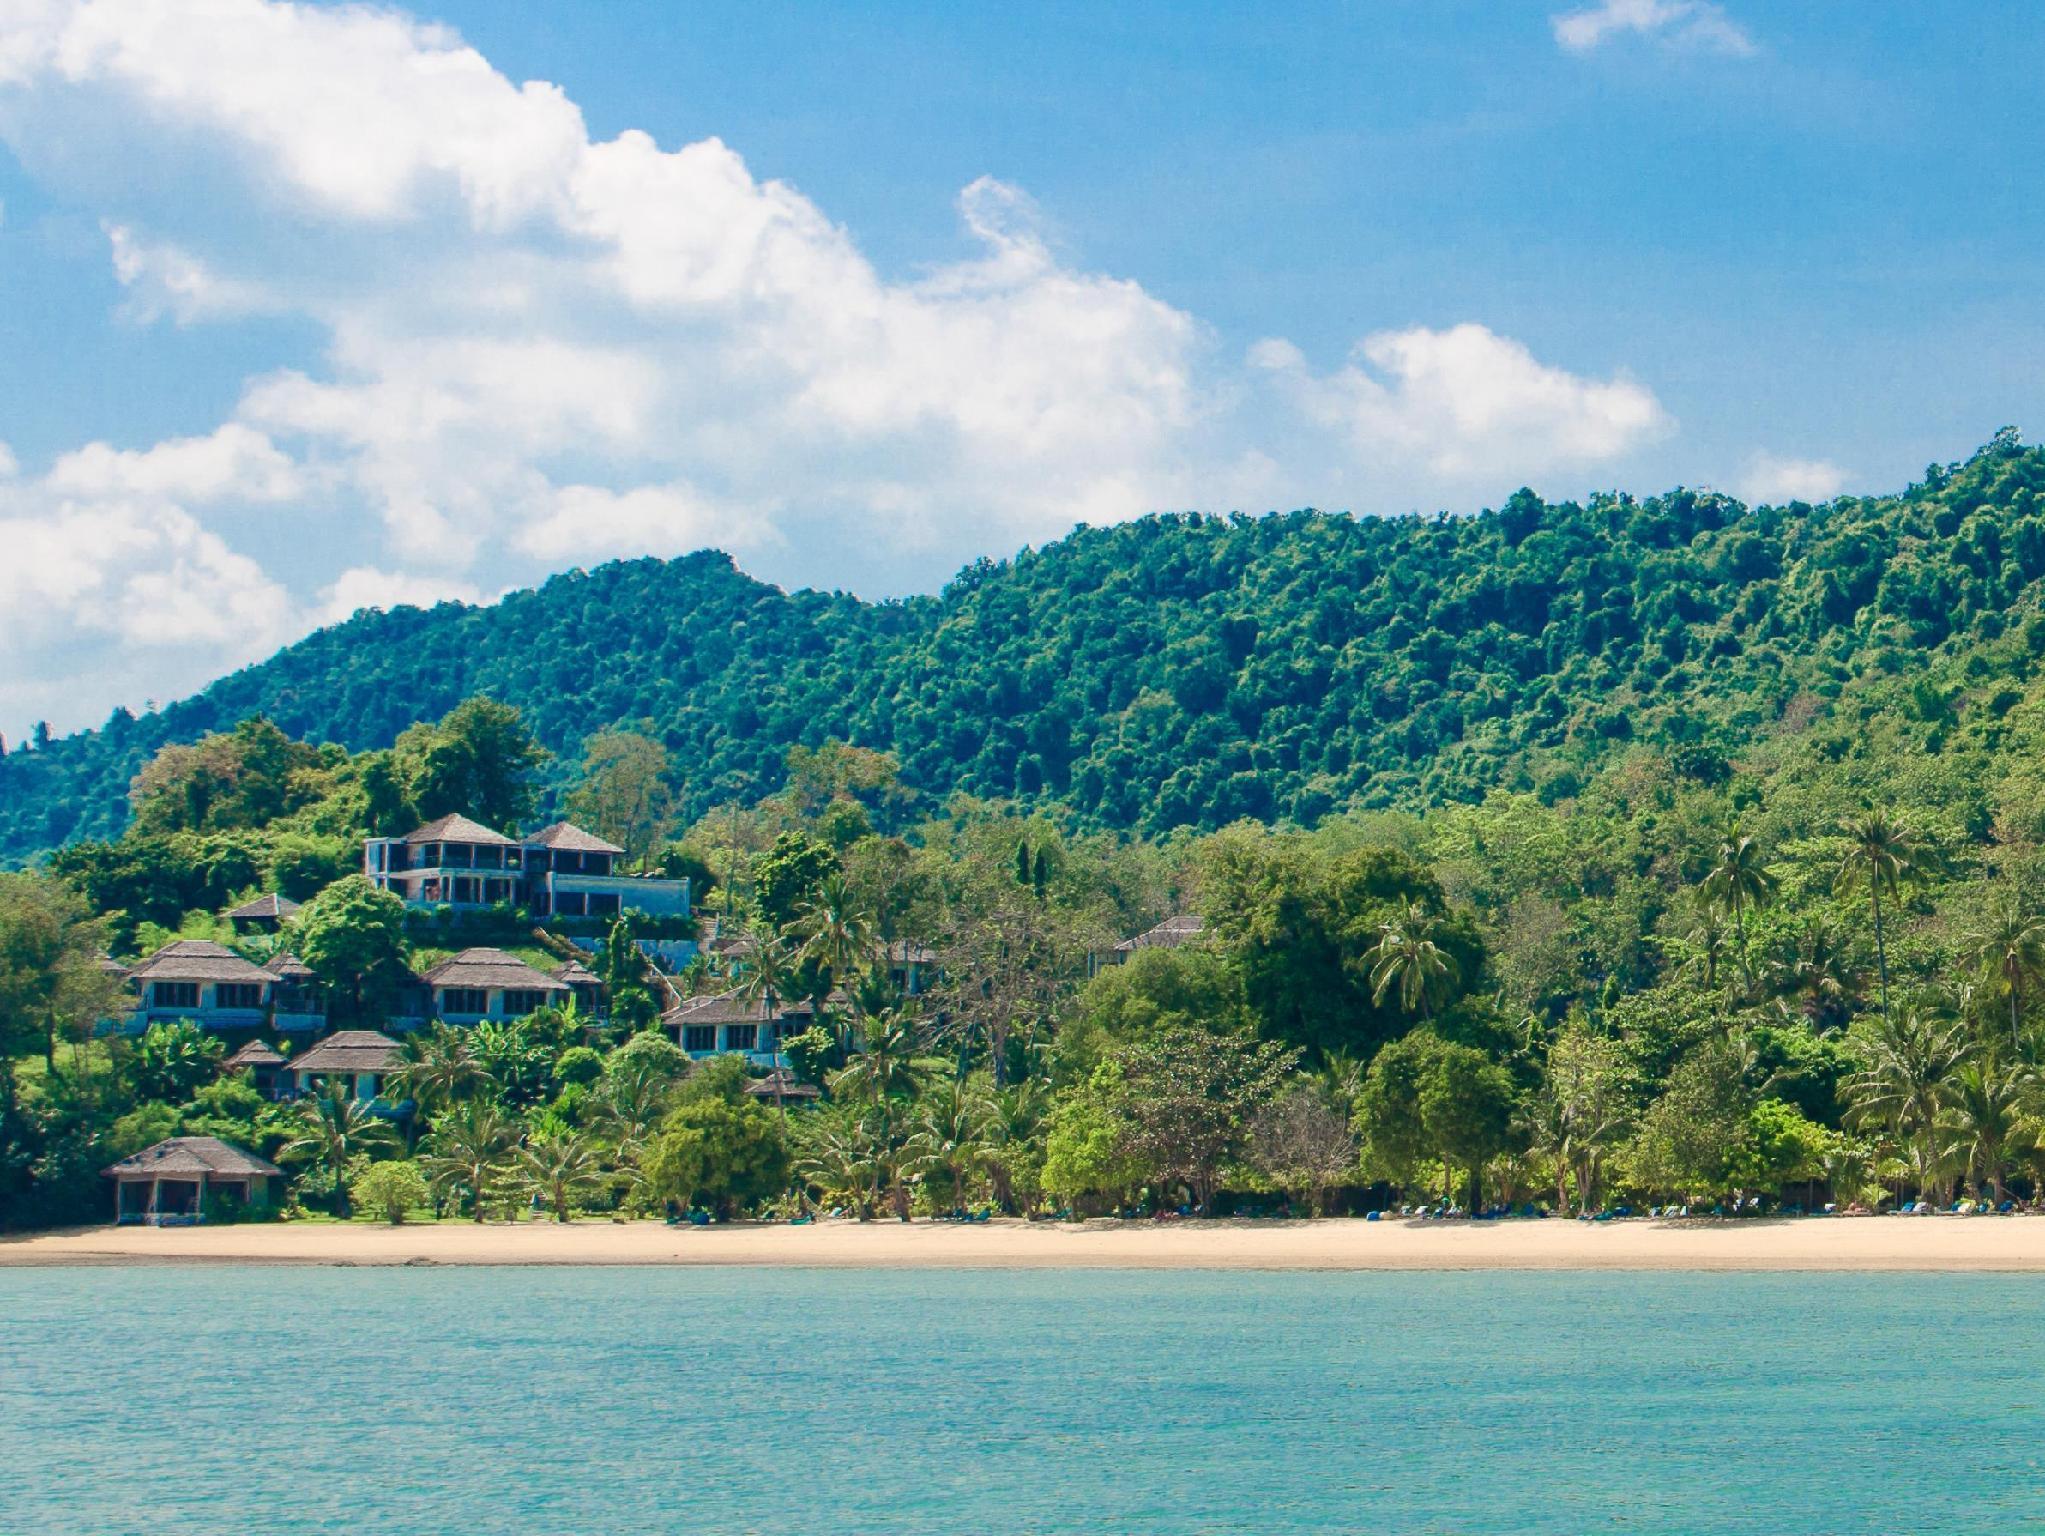 Paradise KohYao Resort พาราไดซ์ เกาะยาว รีสอร์ต